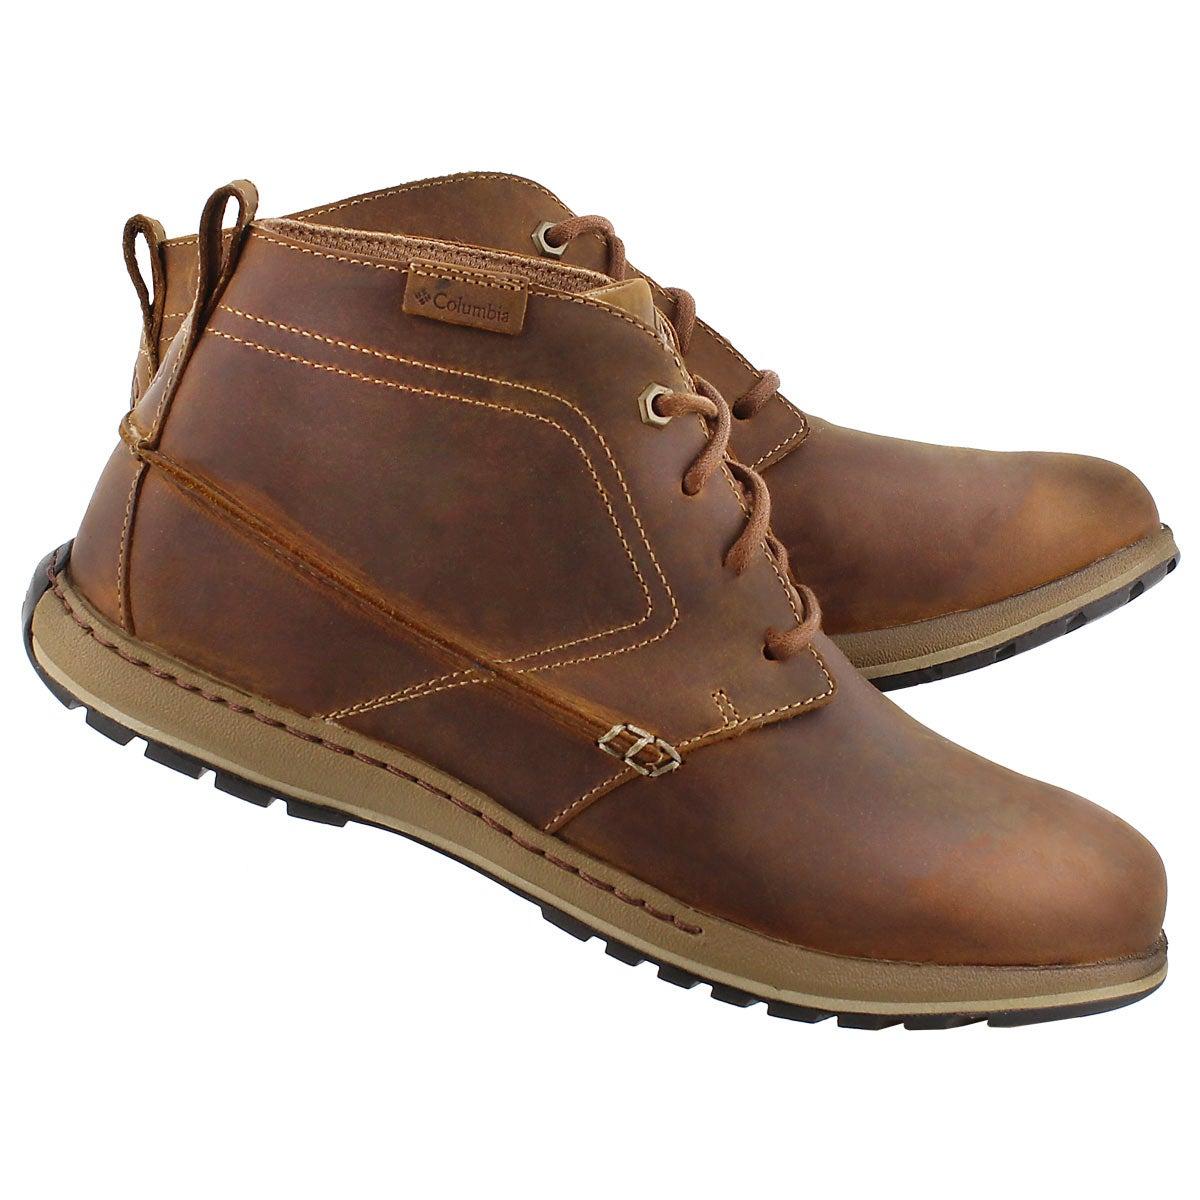 Mns Davenport Chukka nutmeg casual boot